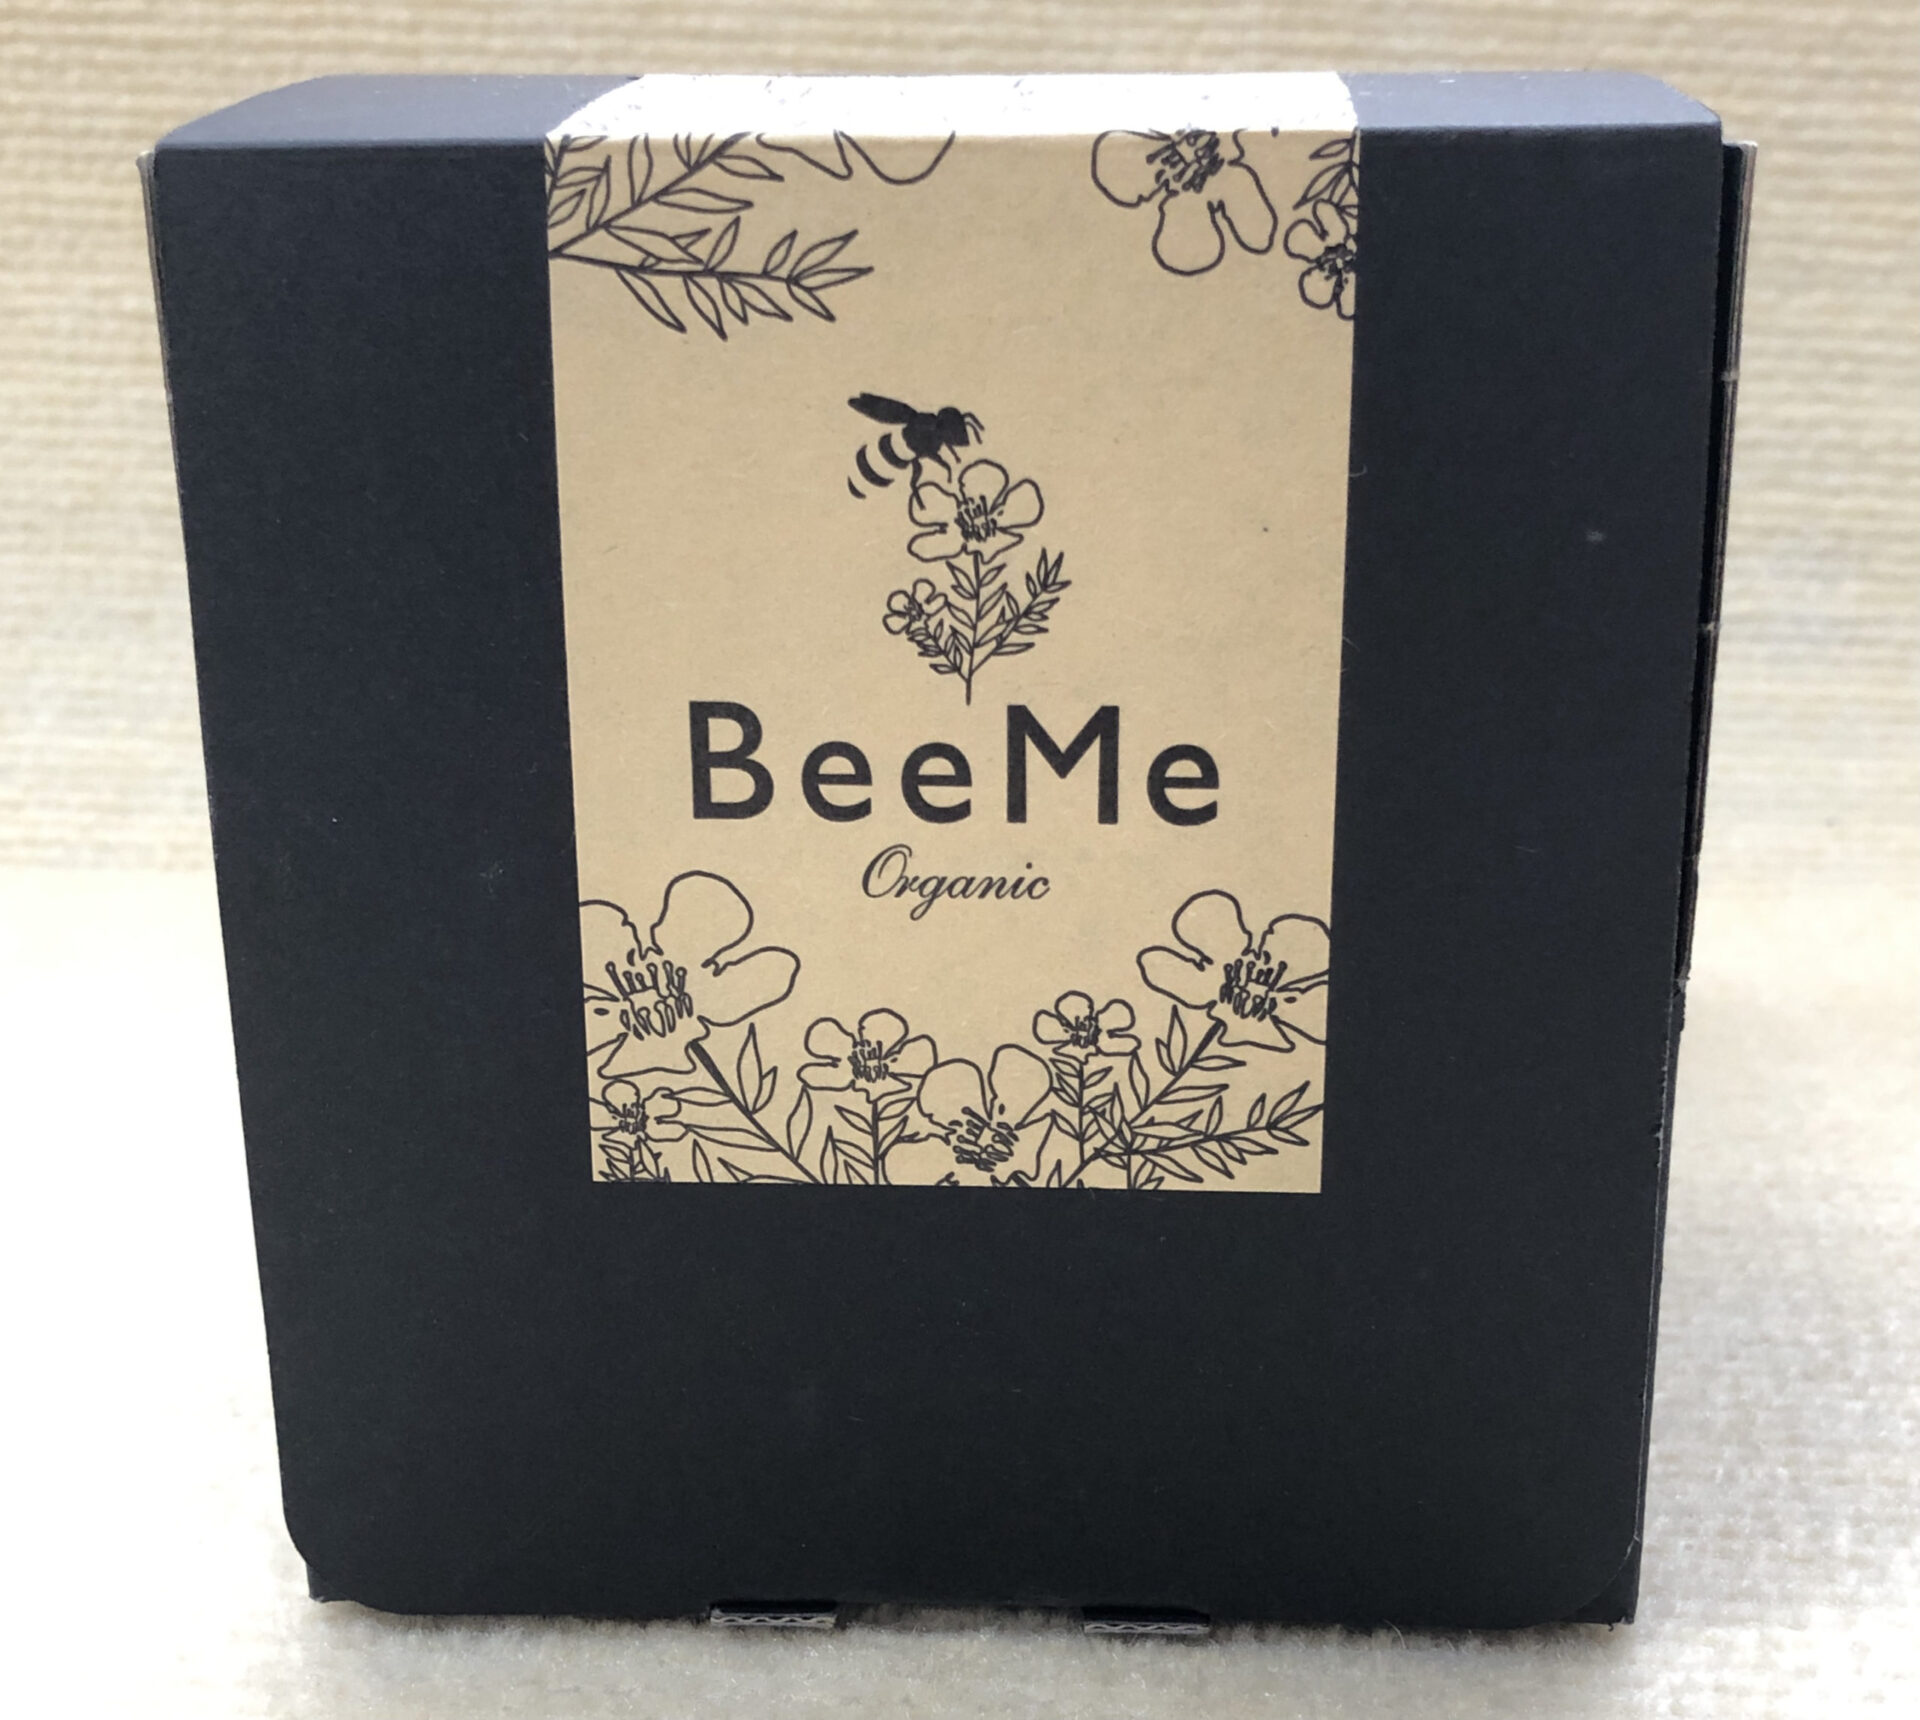 Beeme